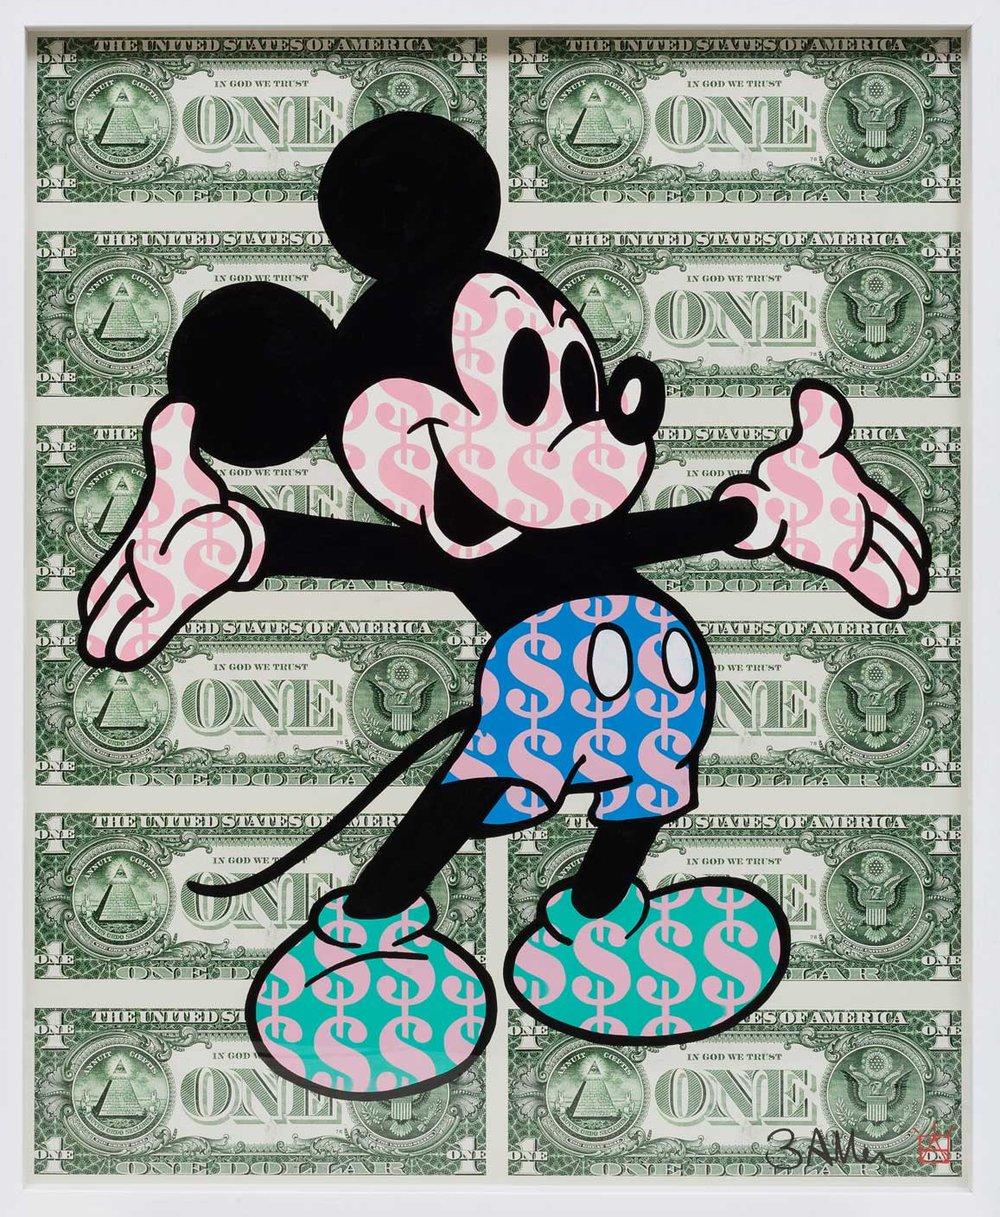 BenAllen_Monster_Mickey_Blue_110cmx135cm_FRAMEDONLY_Acrylic_spraypaint_stencil_giclee_320gsmpaper_£.jpg